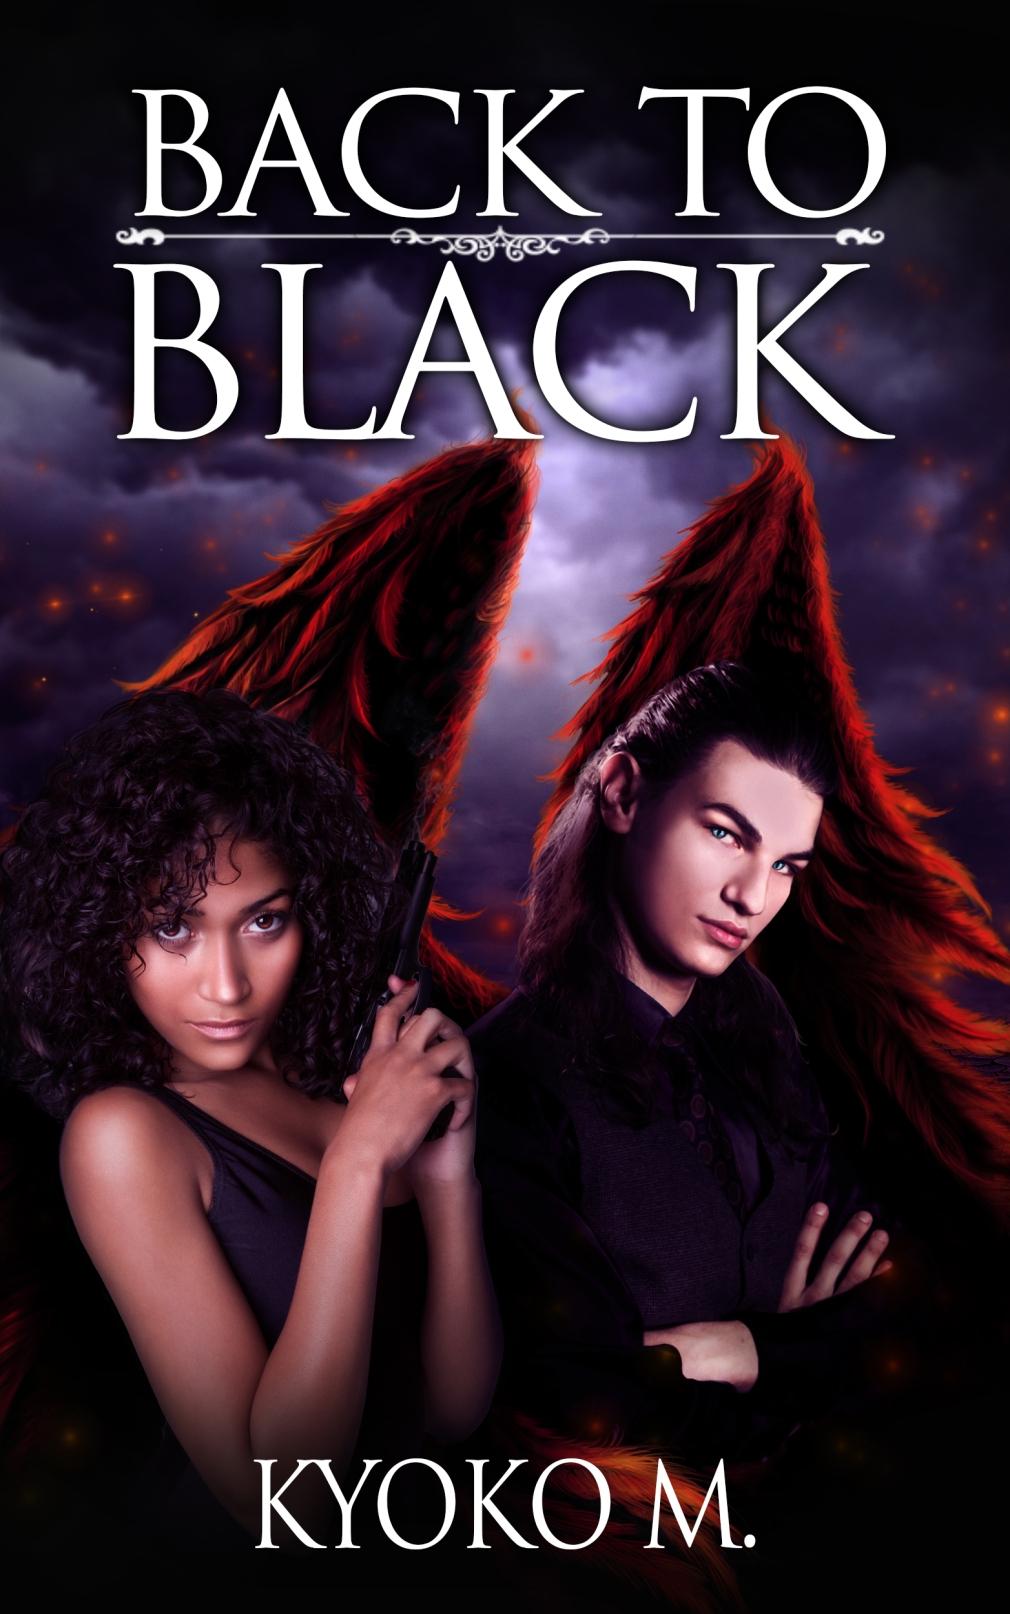 Back to black2.jpg